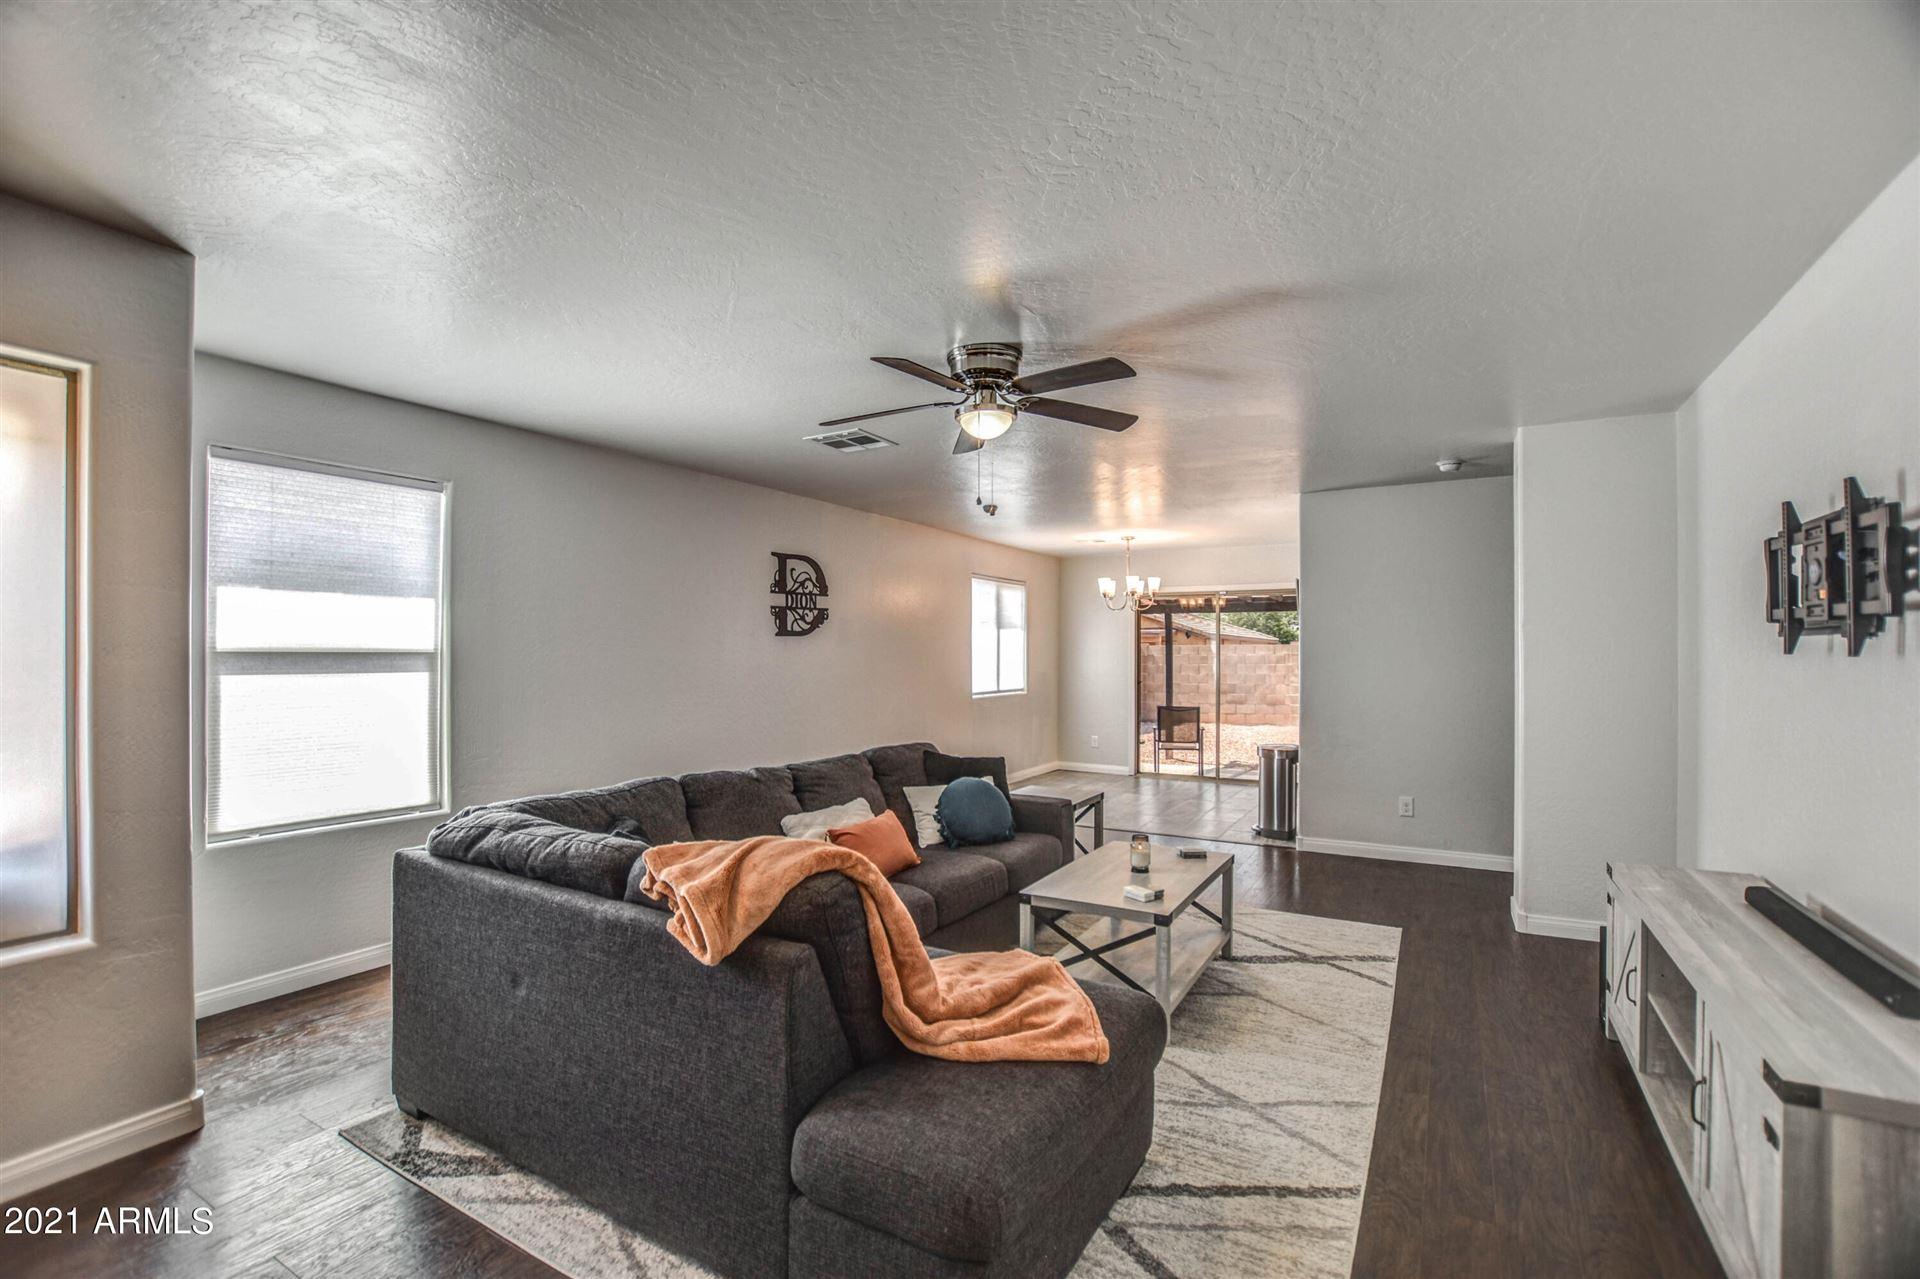 Photo of 5514 S DOVE VALLEY --, Buckeye, AZ 85326 (MLS # 6295678)